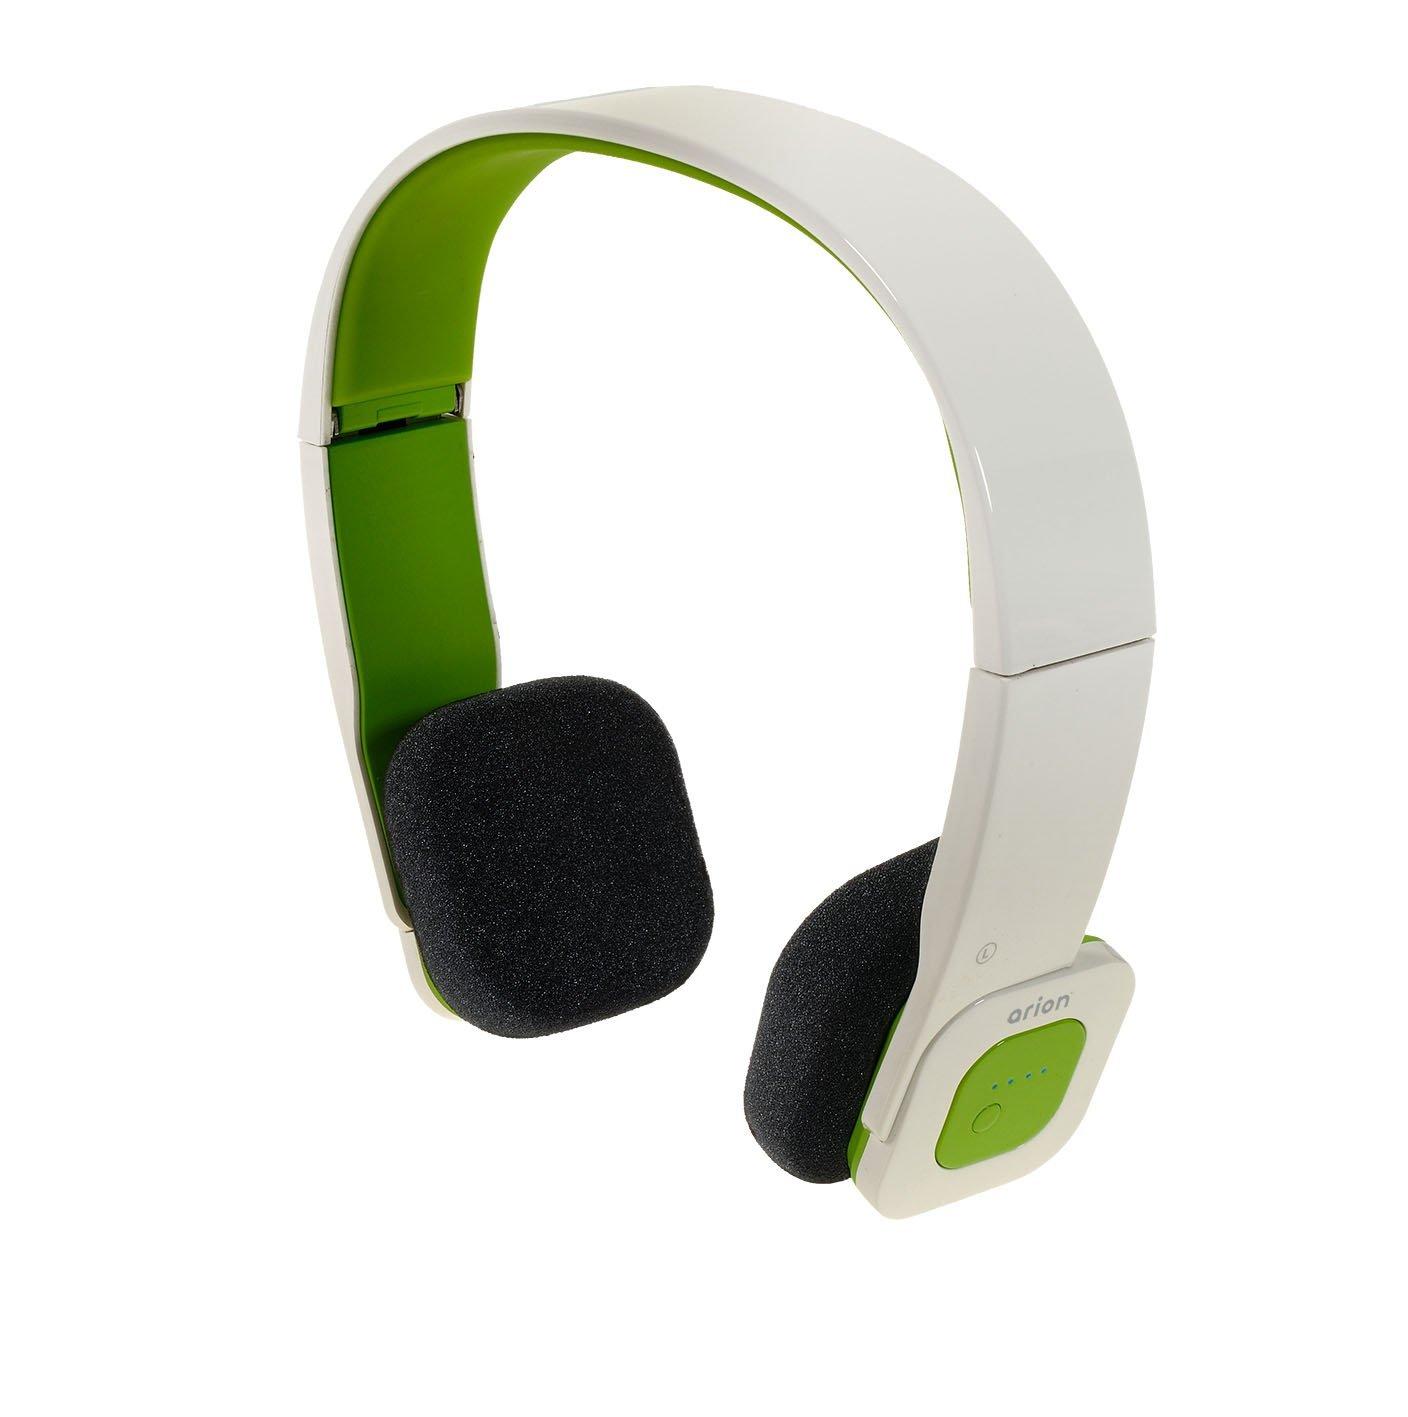 Eagle Tech Foldable Bluetooth Headset W Wireless Calling Music Playback Walmart Com Walmart Com